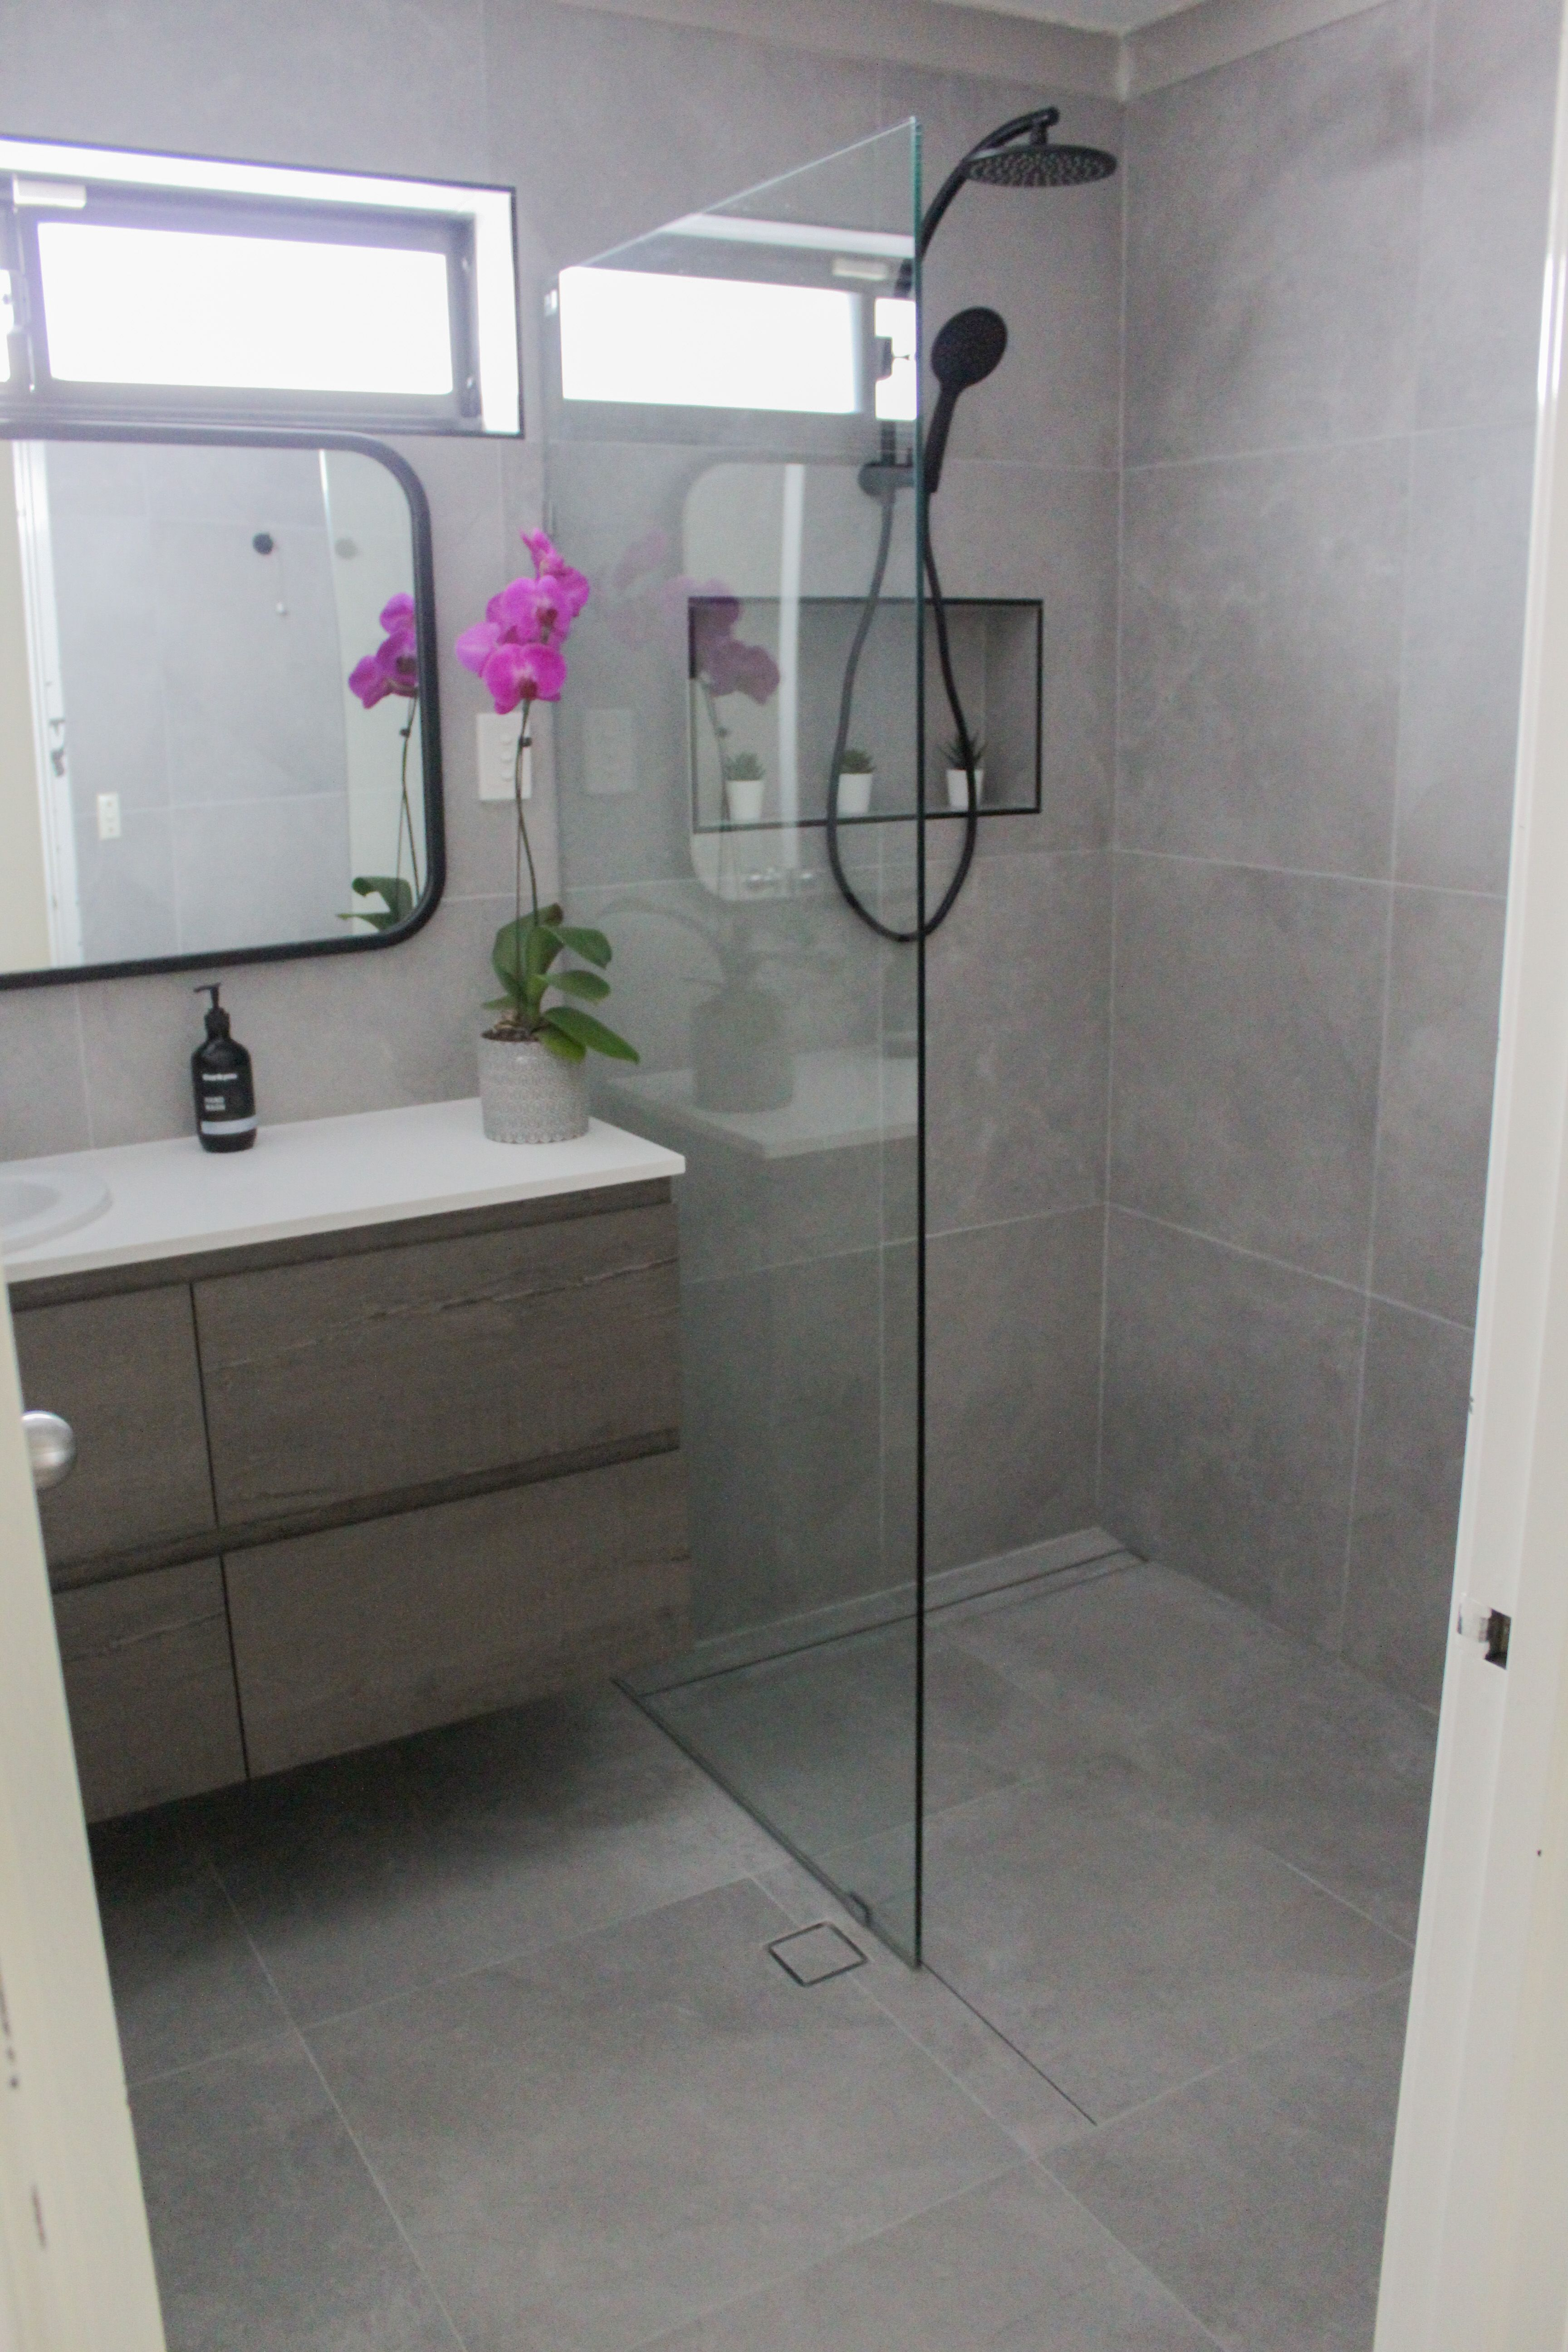 Walk In Shower Bathroom Renovations Wall Hung Vanity Small Bathroom Renovations